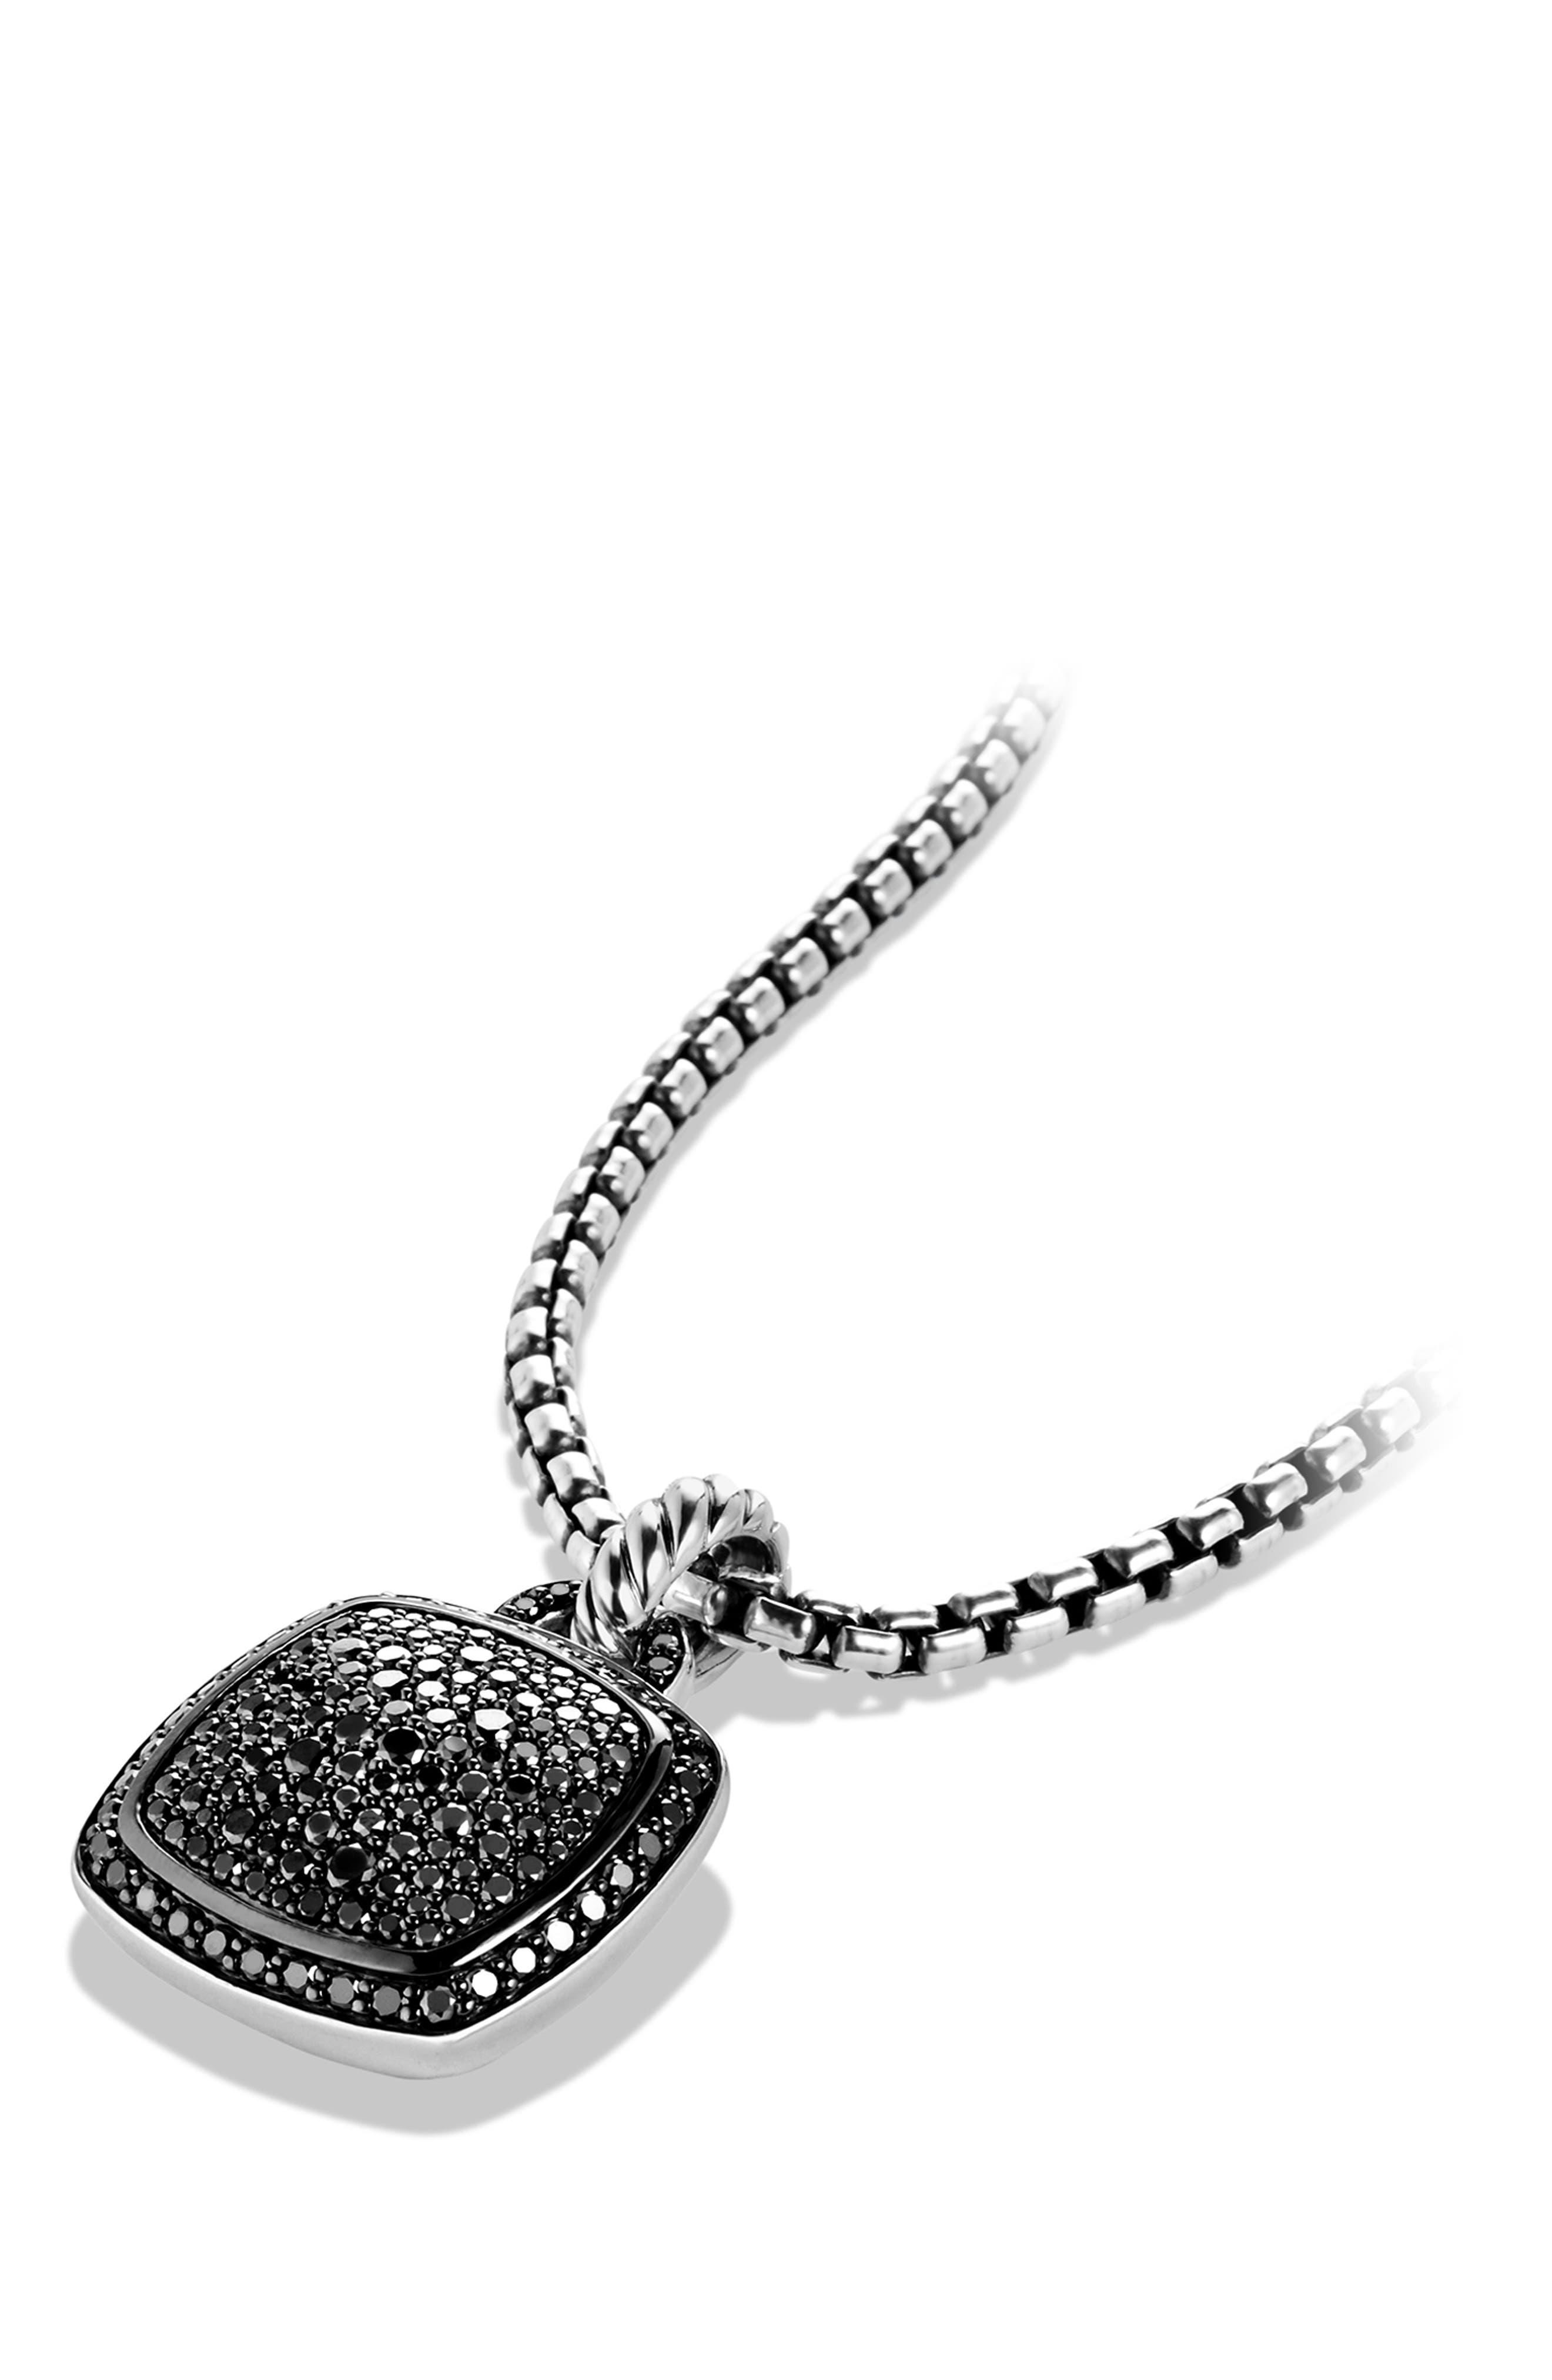 'Albion' Pendant with Diamonds,                             Alternate thumbnail 6, color,                             BLACK DIAMOND